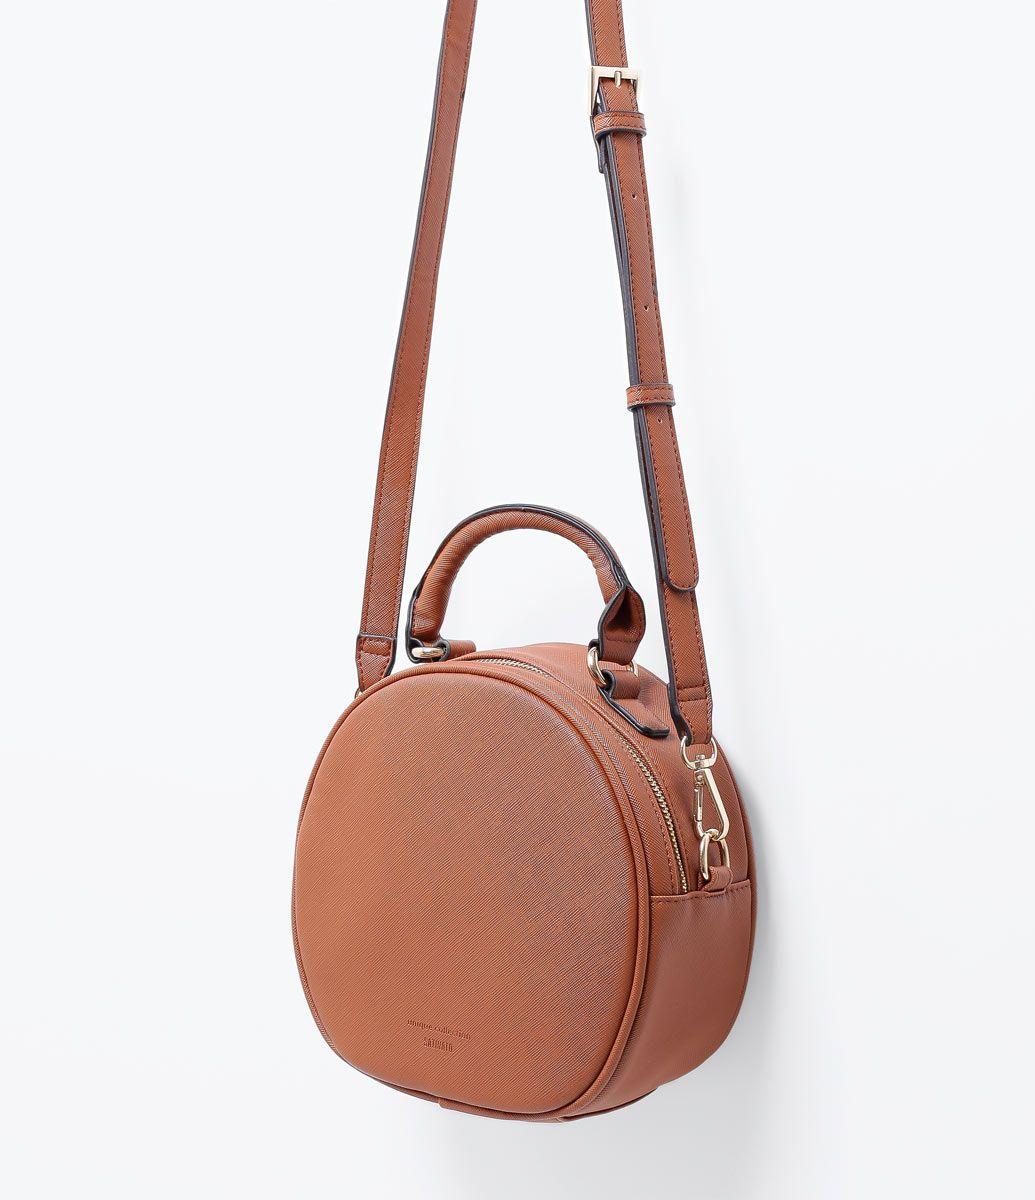 81caf49dd Bolsa feminina Modelo transversal Redonda Lisa Marca: Satinato Material:  sintético Composição: 100%